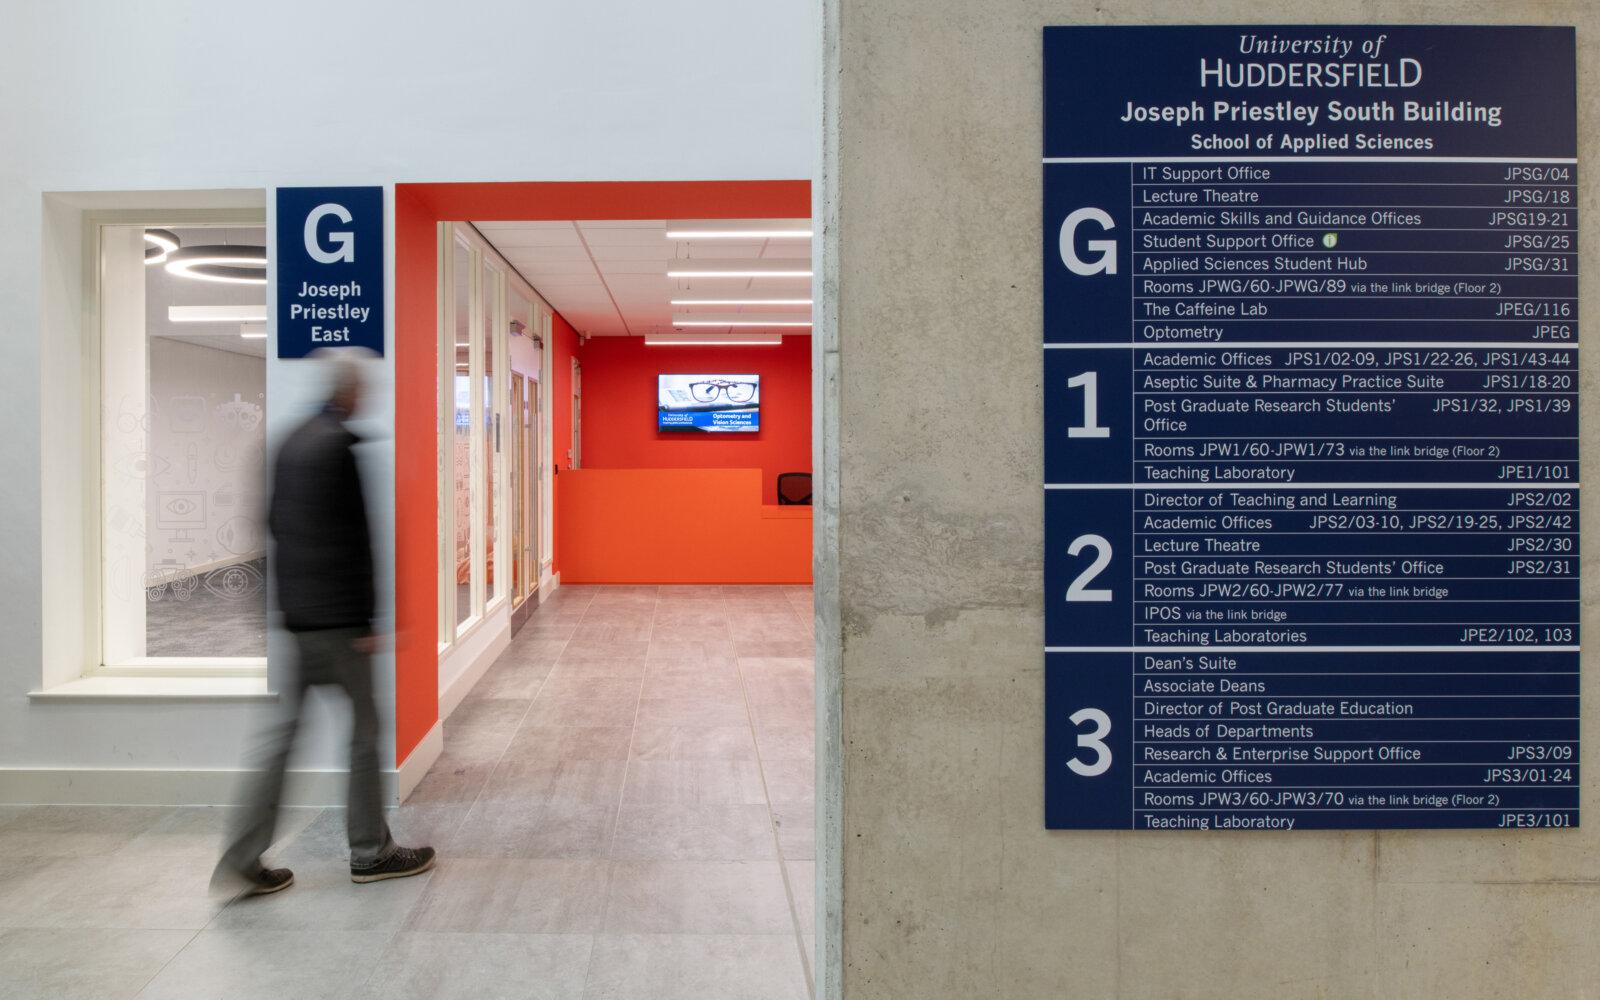 Joseph Priestley East Building University of Huddersfield interior walkway